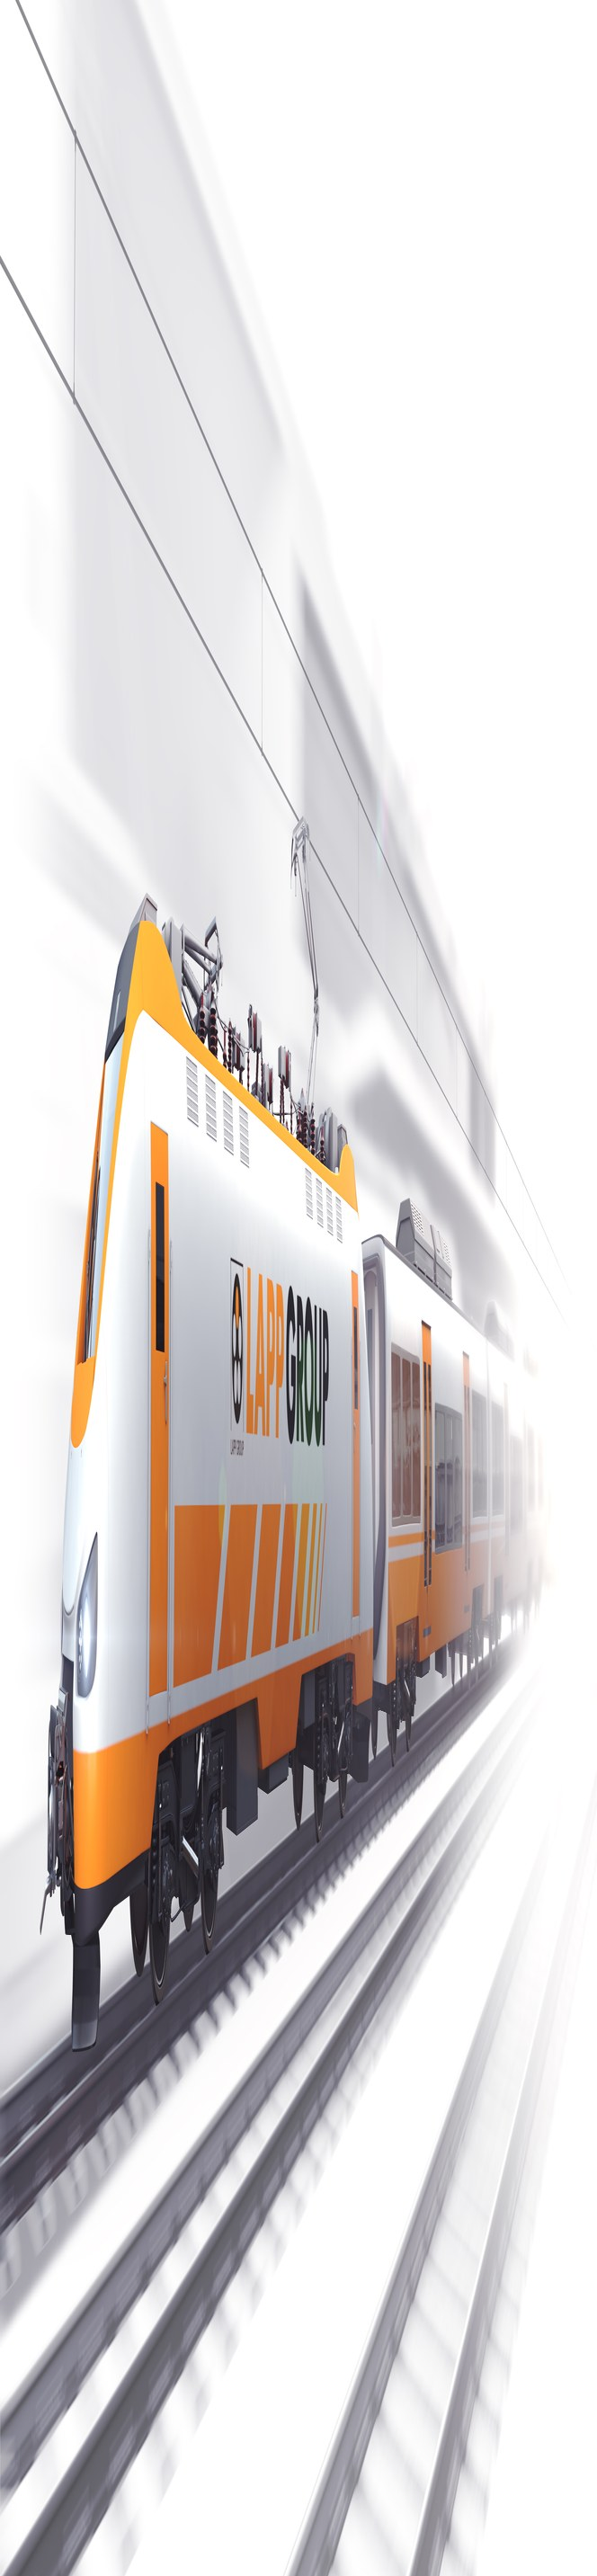 Bild Train quer